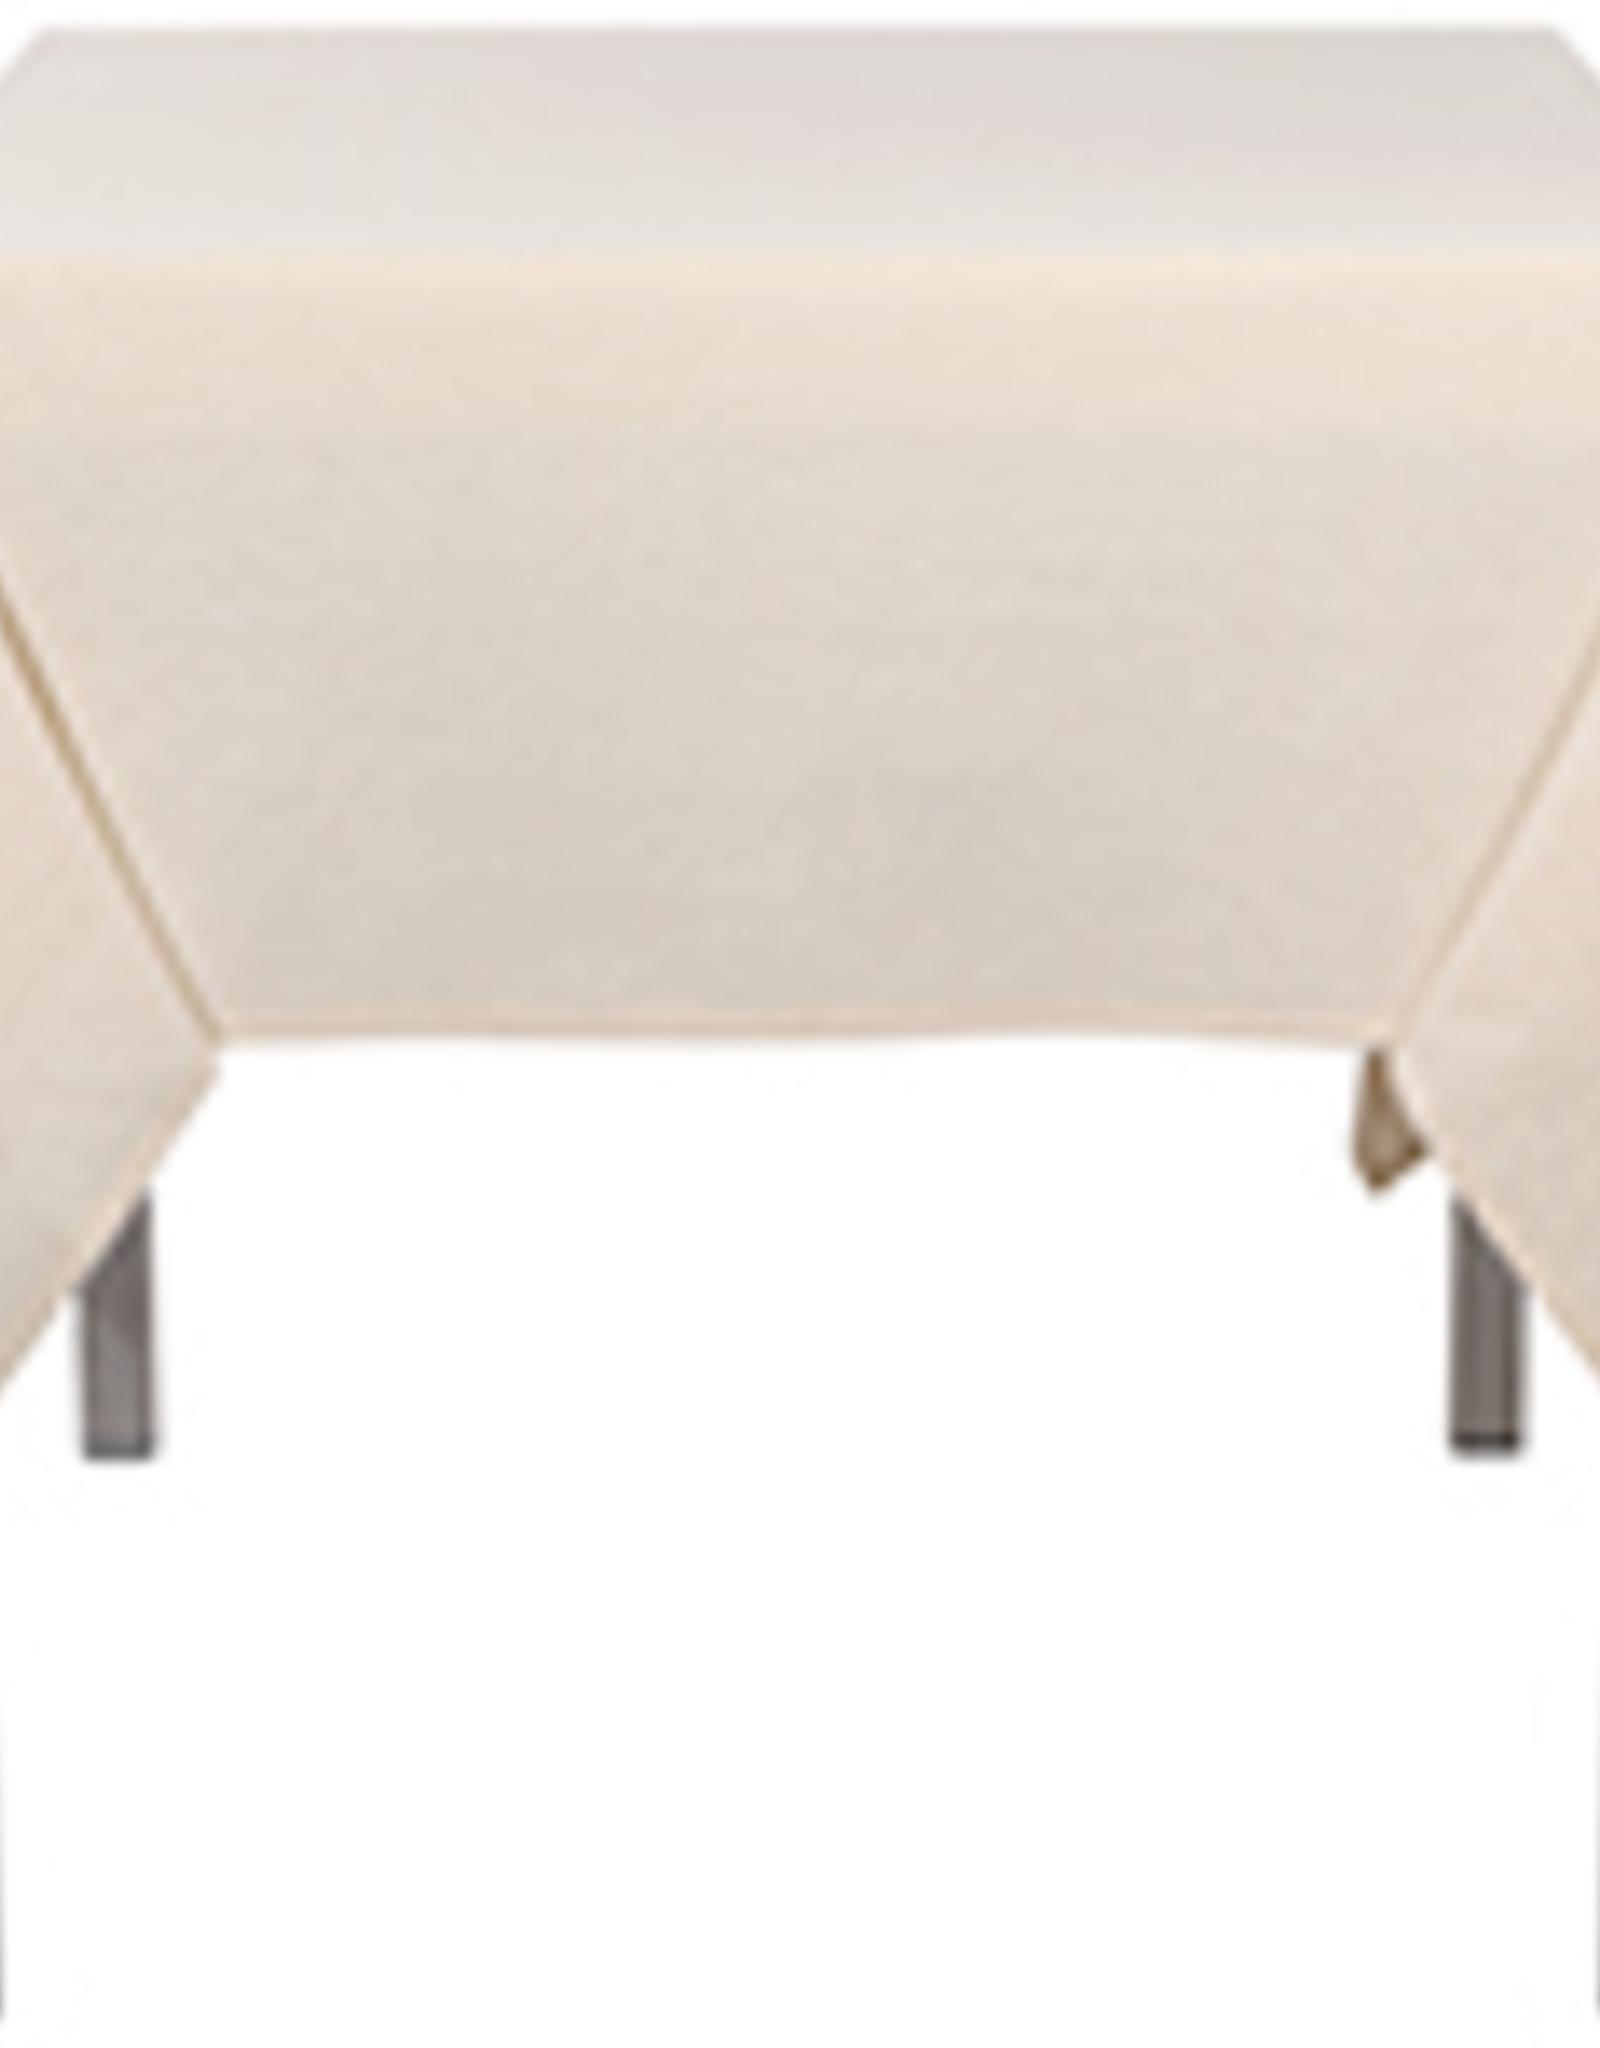 Gold Tablecloth 60x90